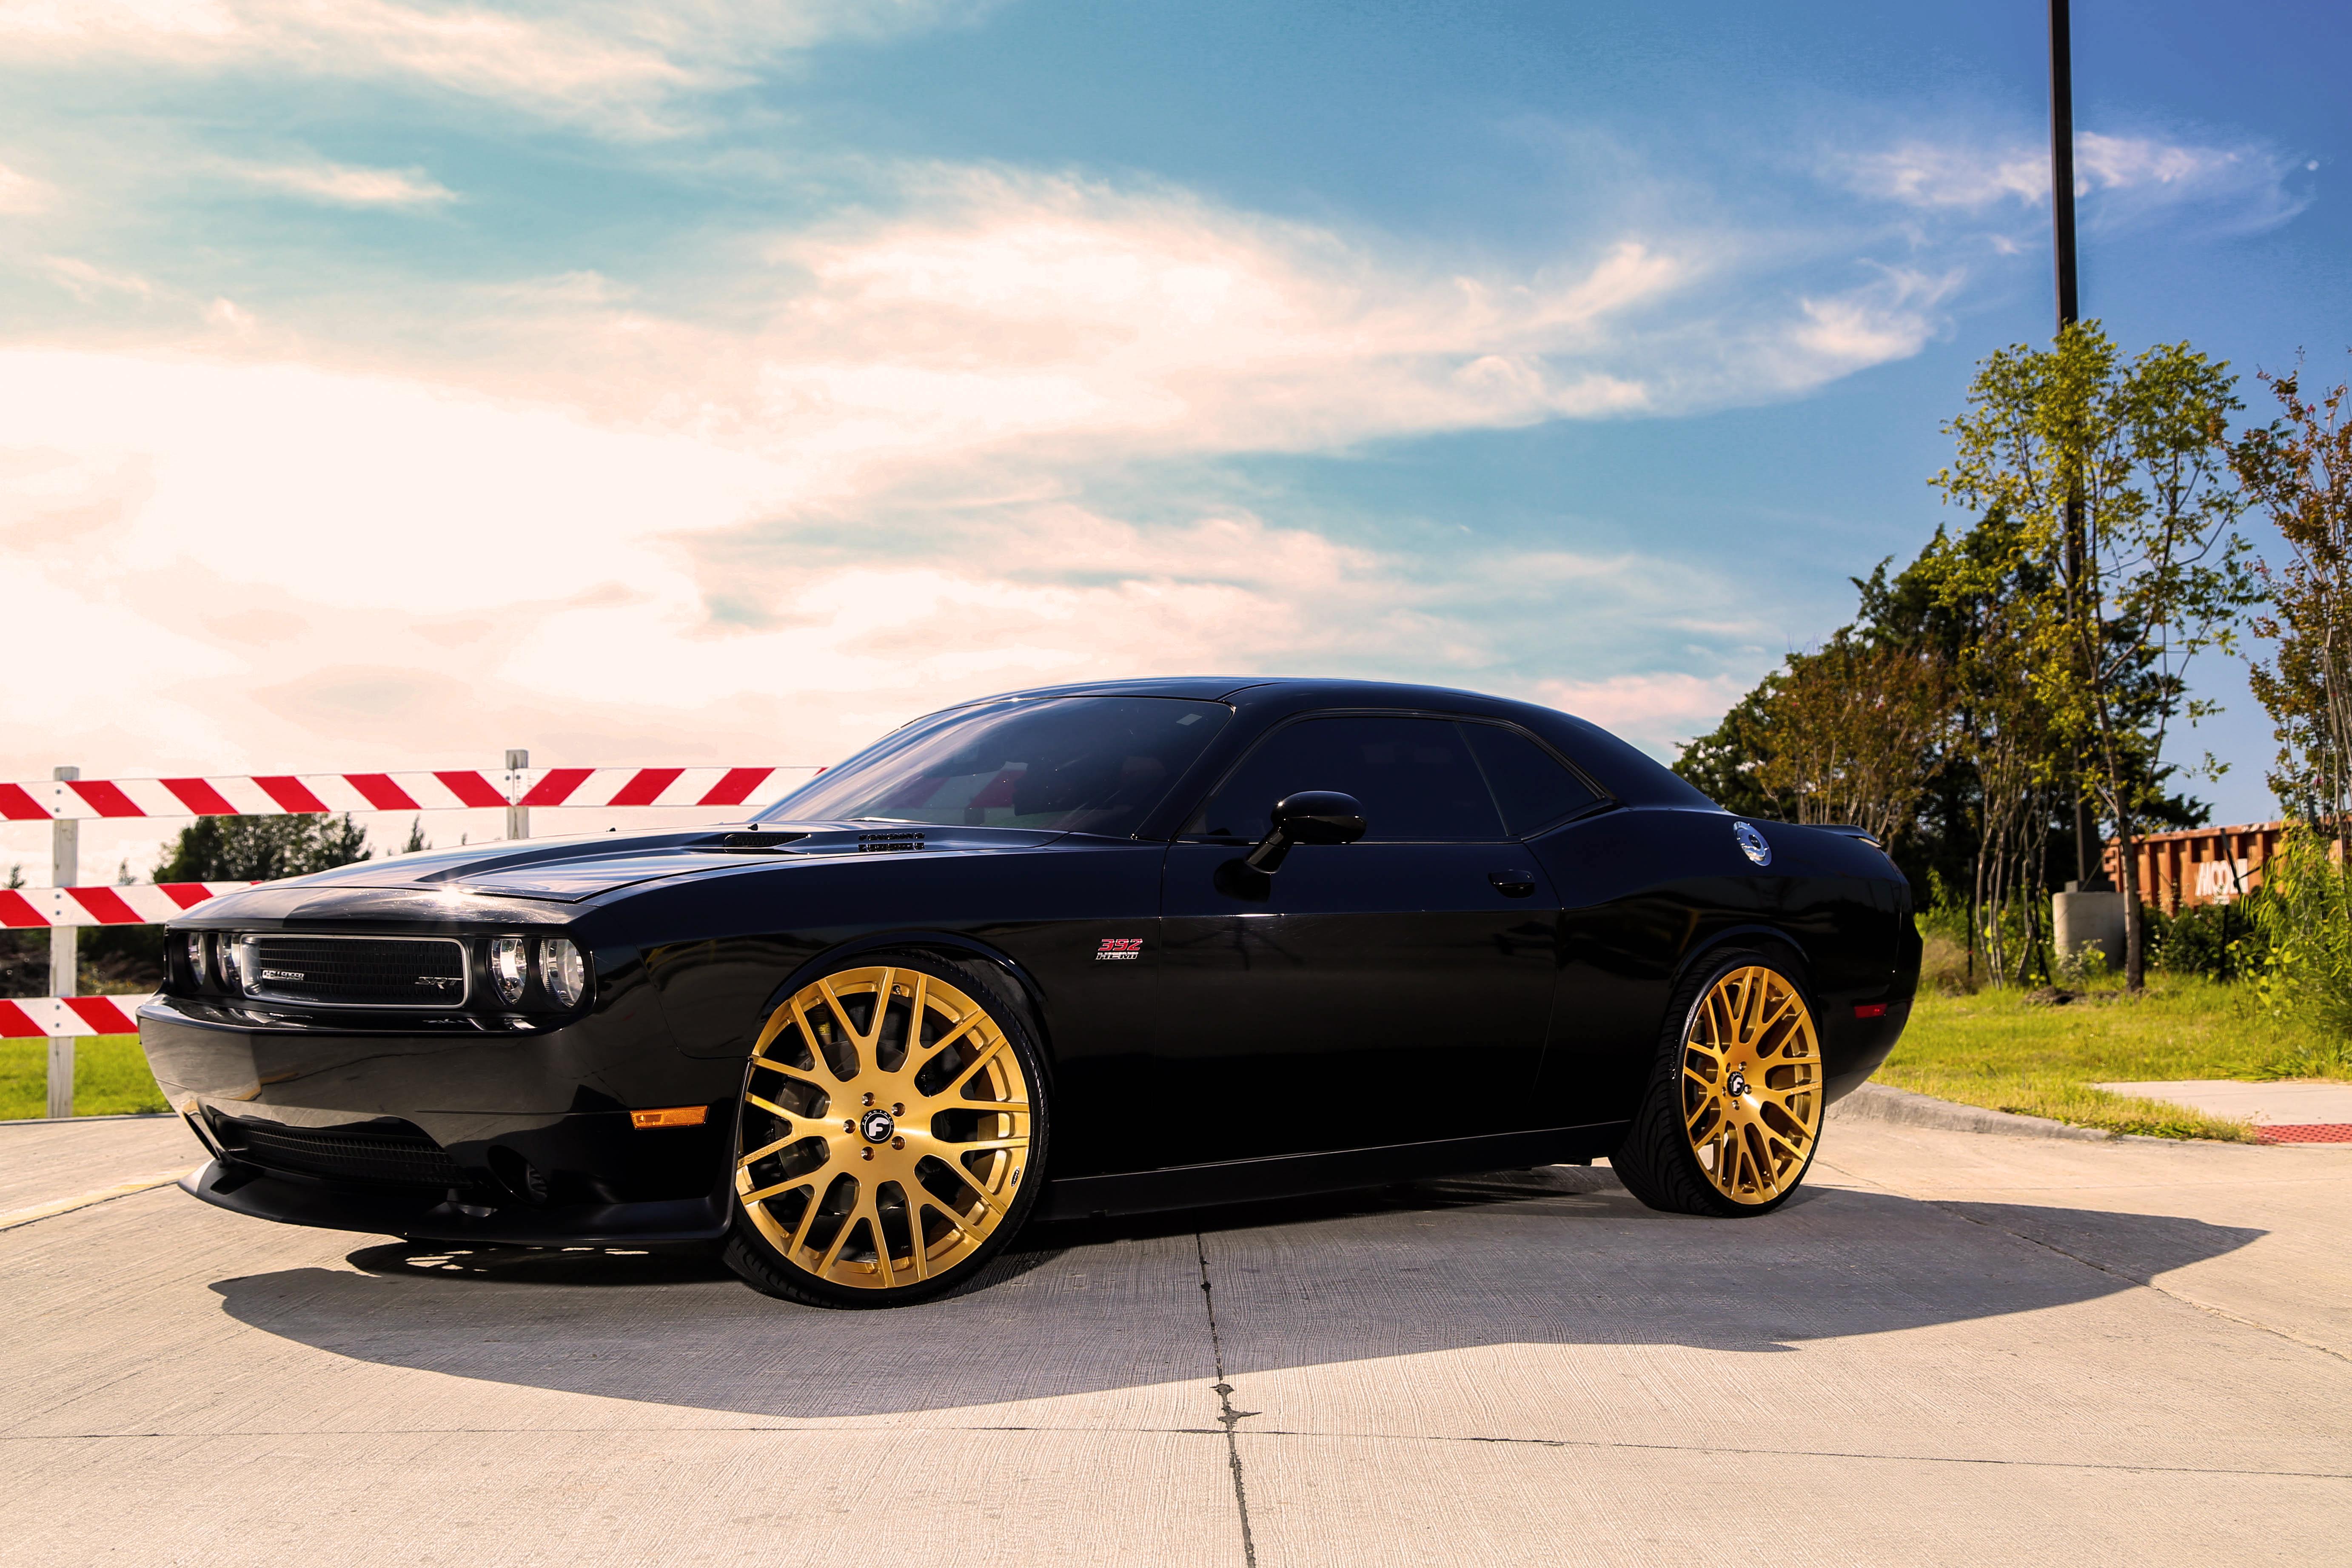 Dodge Challenger Hellcat Blue >> Dodge Challenger SRT On Forgiato Freddos - Rides Magazine